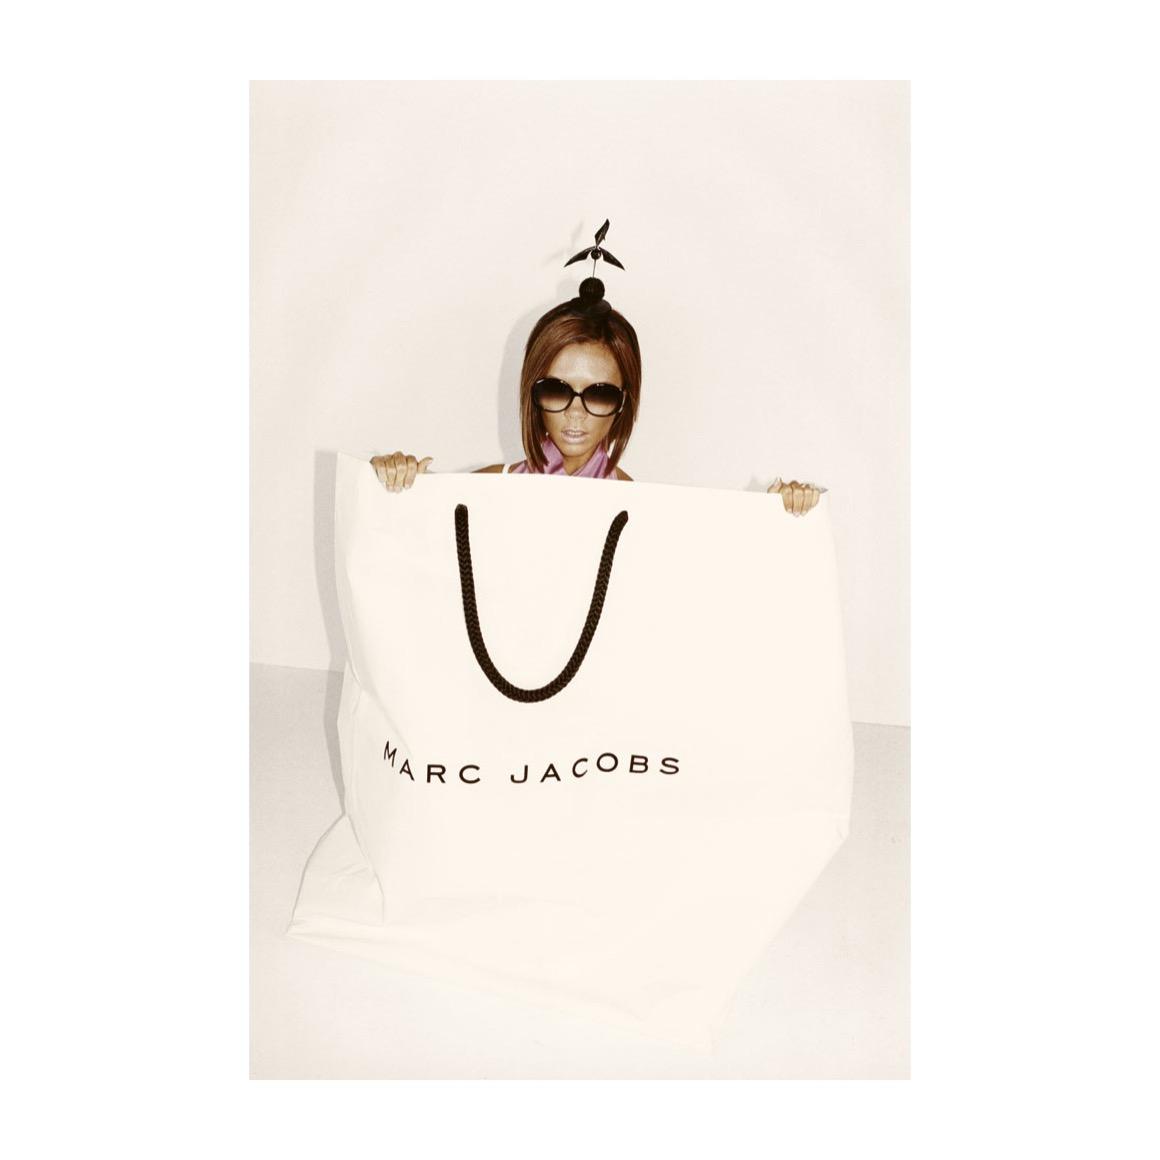 iconic fashion photographer juergen teller marc jacobs